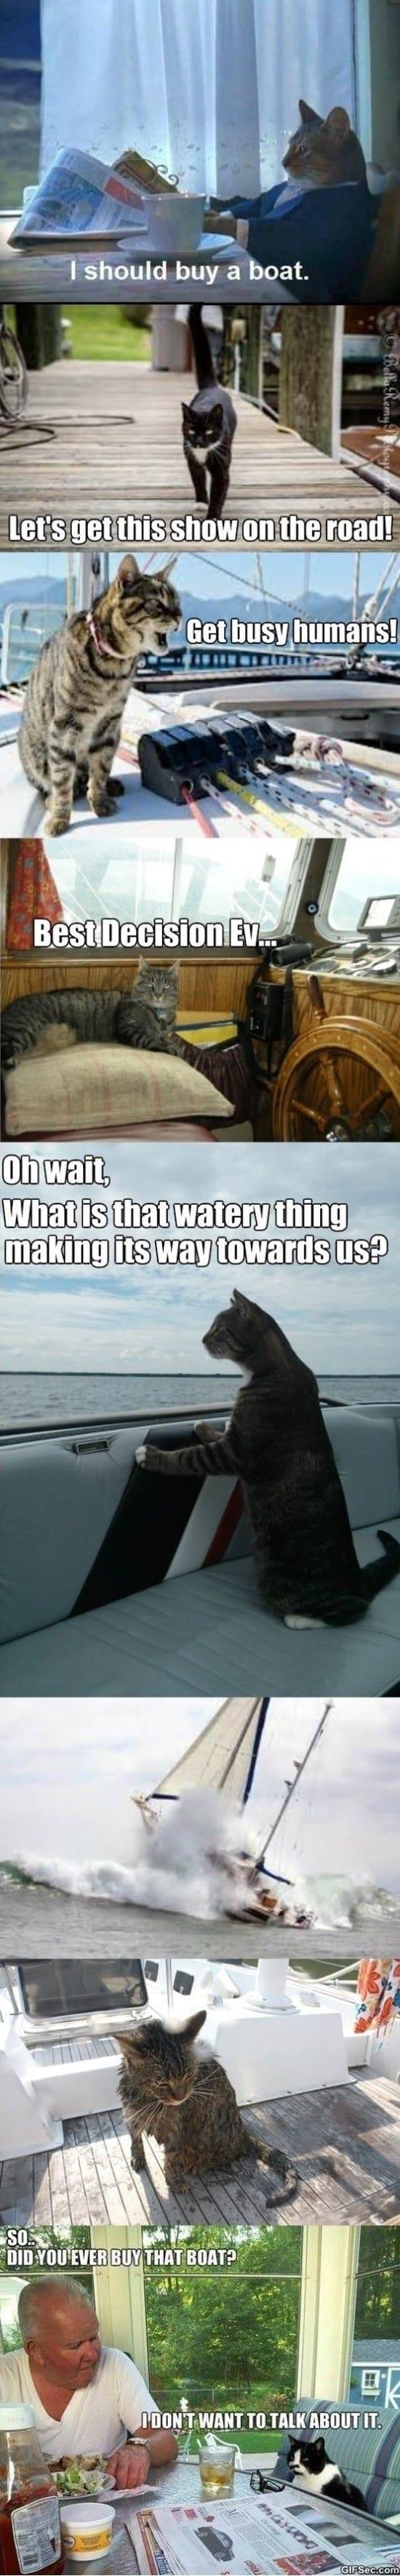 i-should-buy-a-boat-meme